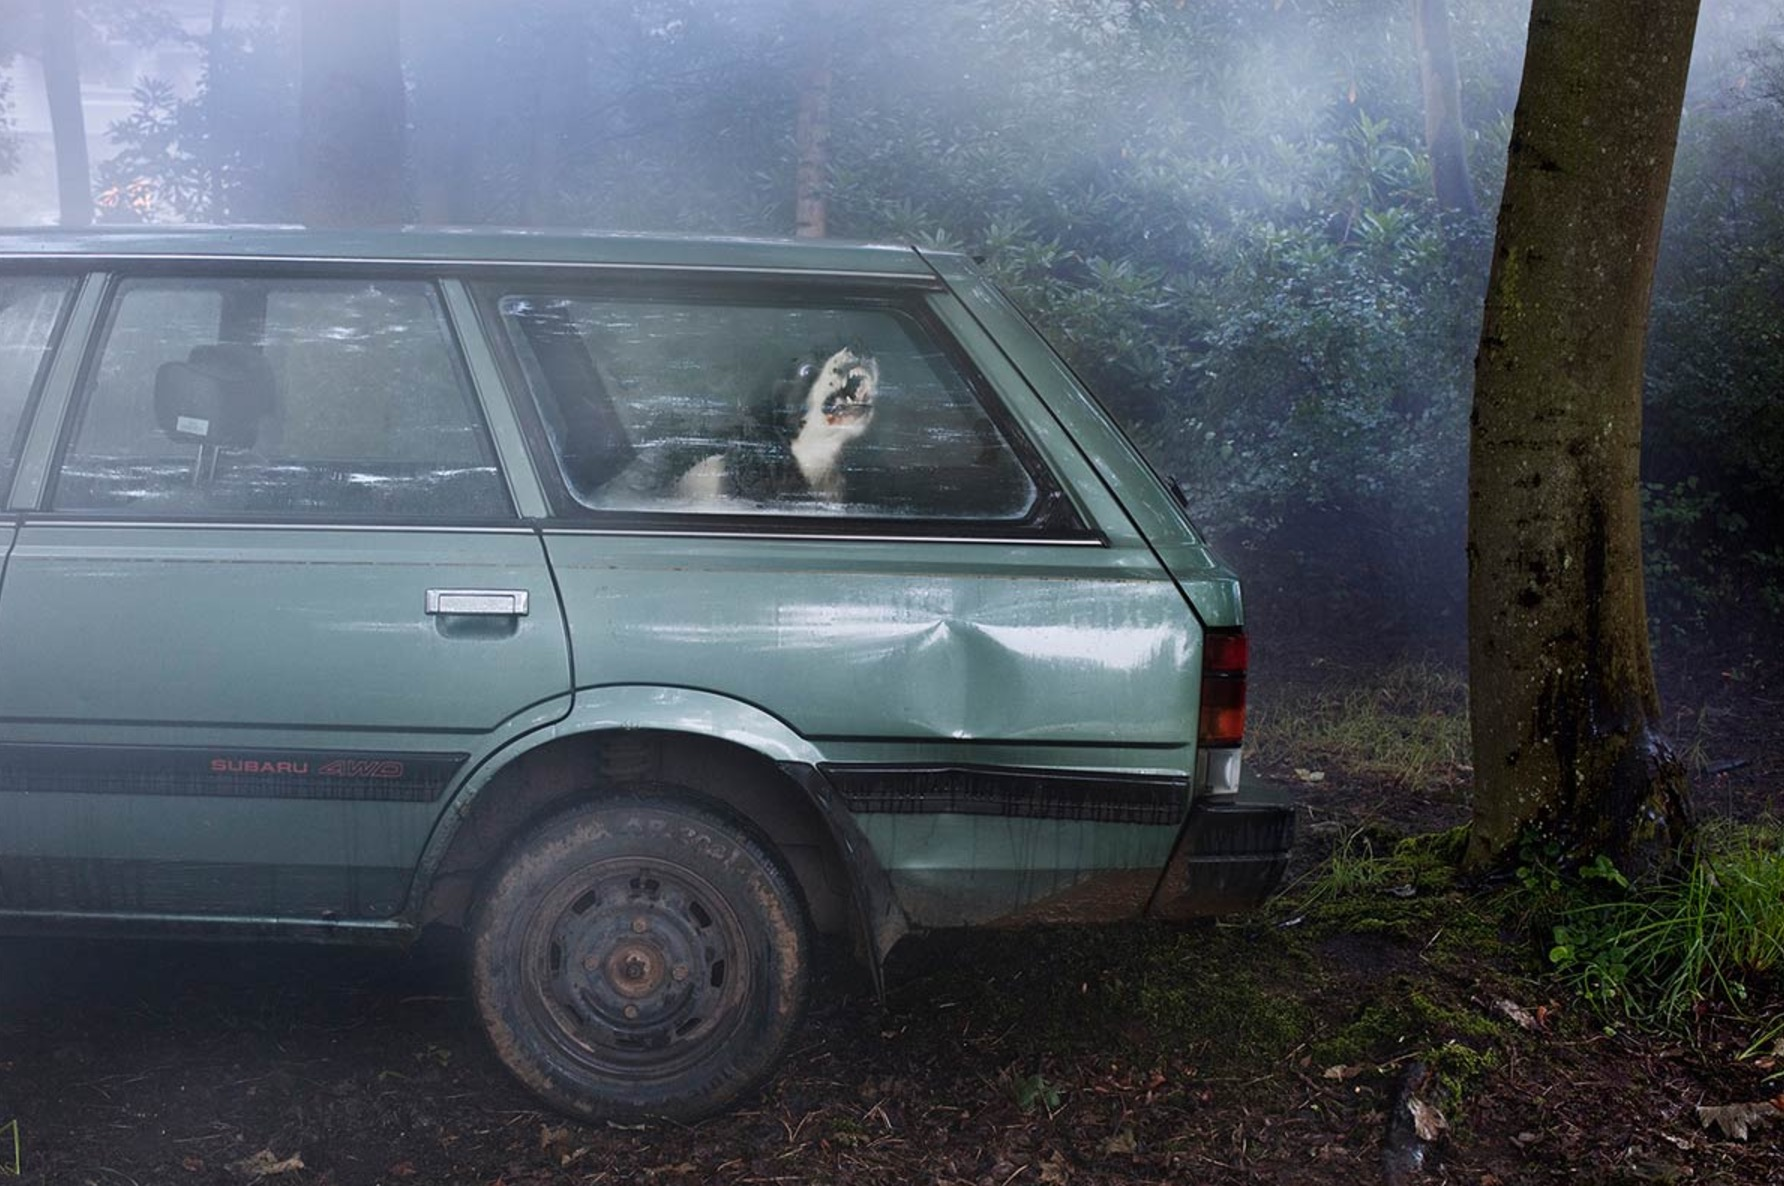 Martin-Usborne-photographe-chiens-voitures-9